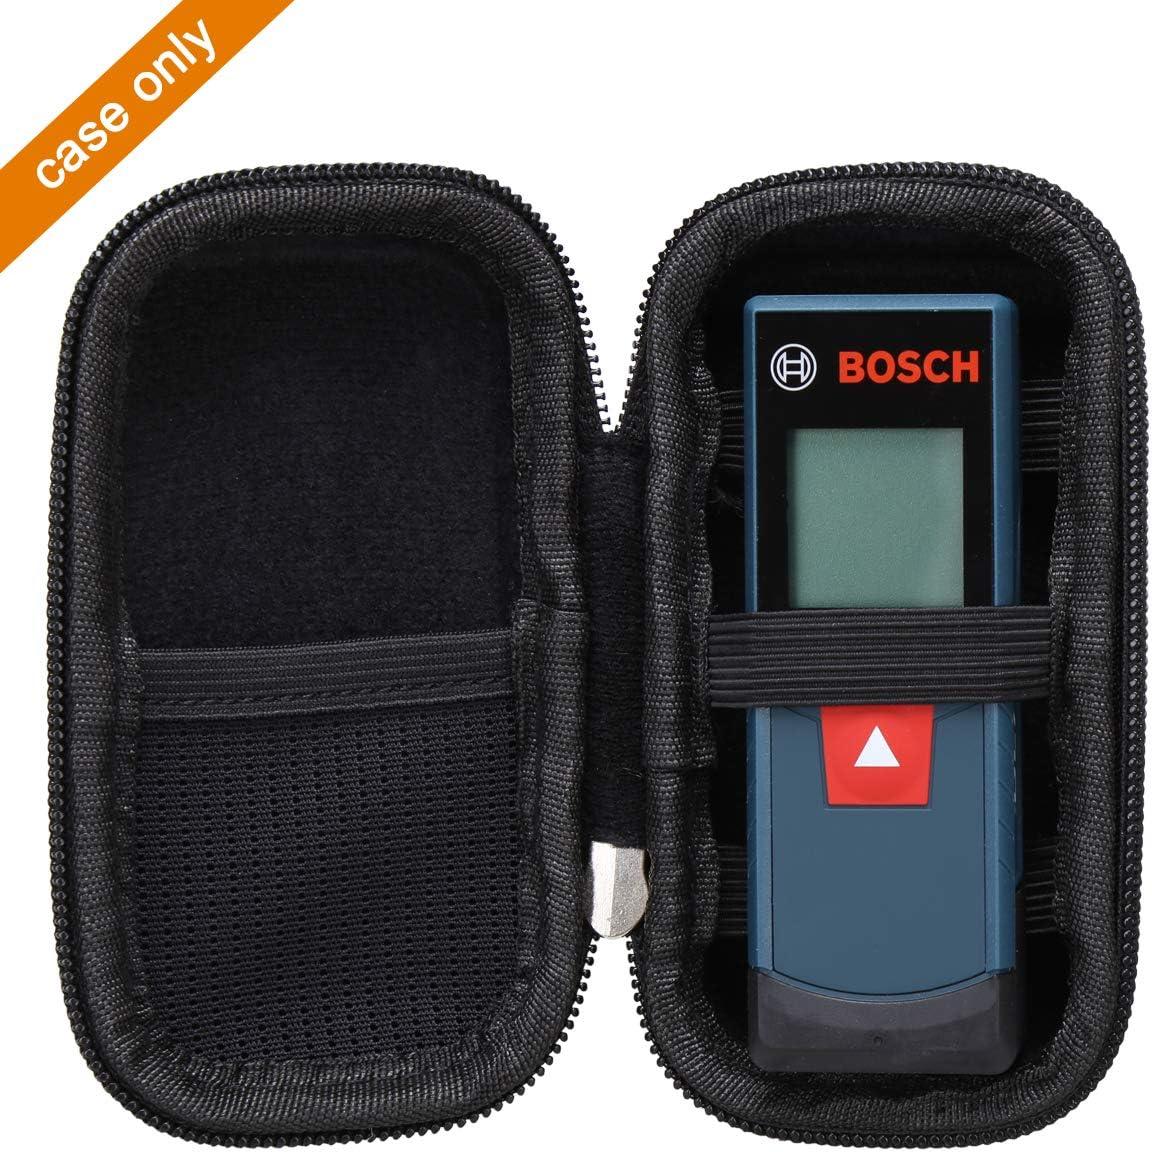 Aproca Hard Carry Travel Case for Bosch GLM 20 Compact Blaze 65' Laser Distance Measure